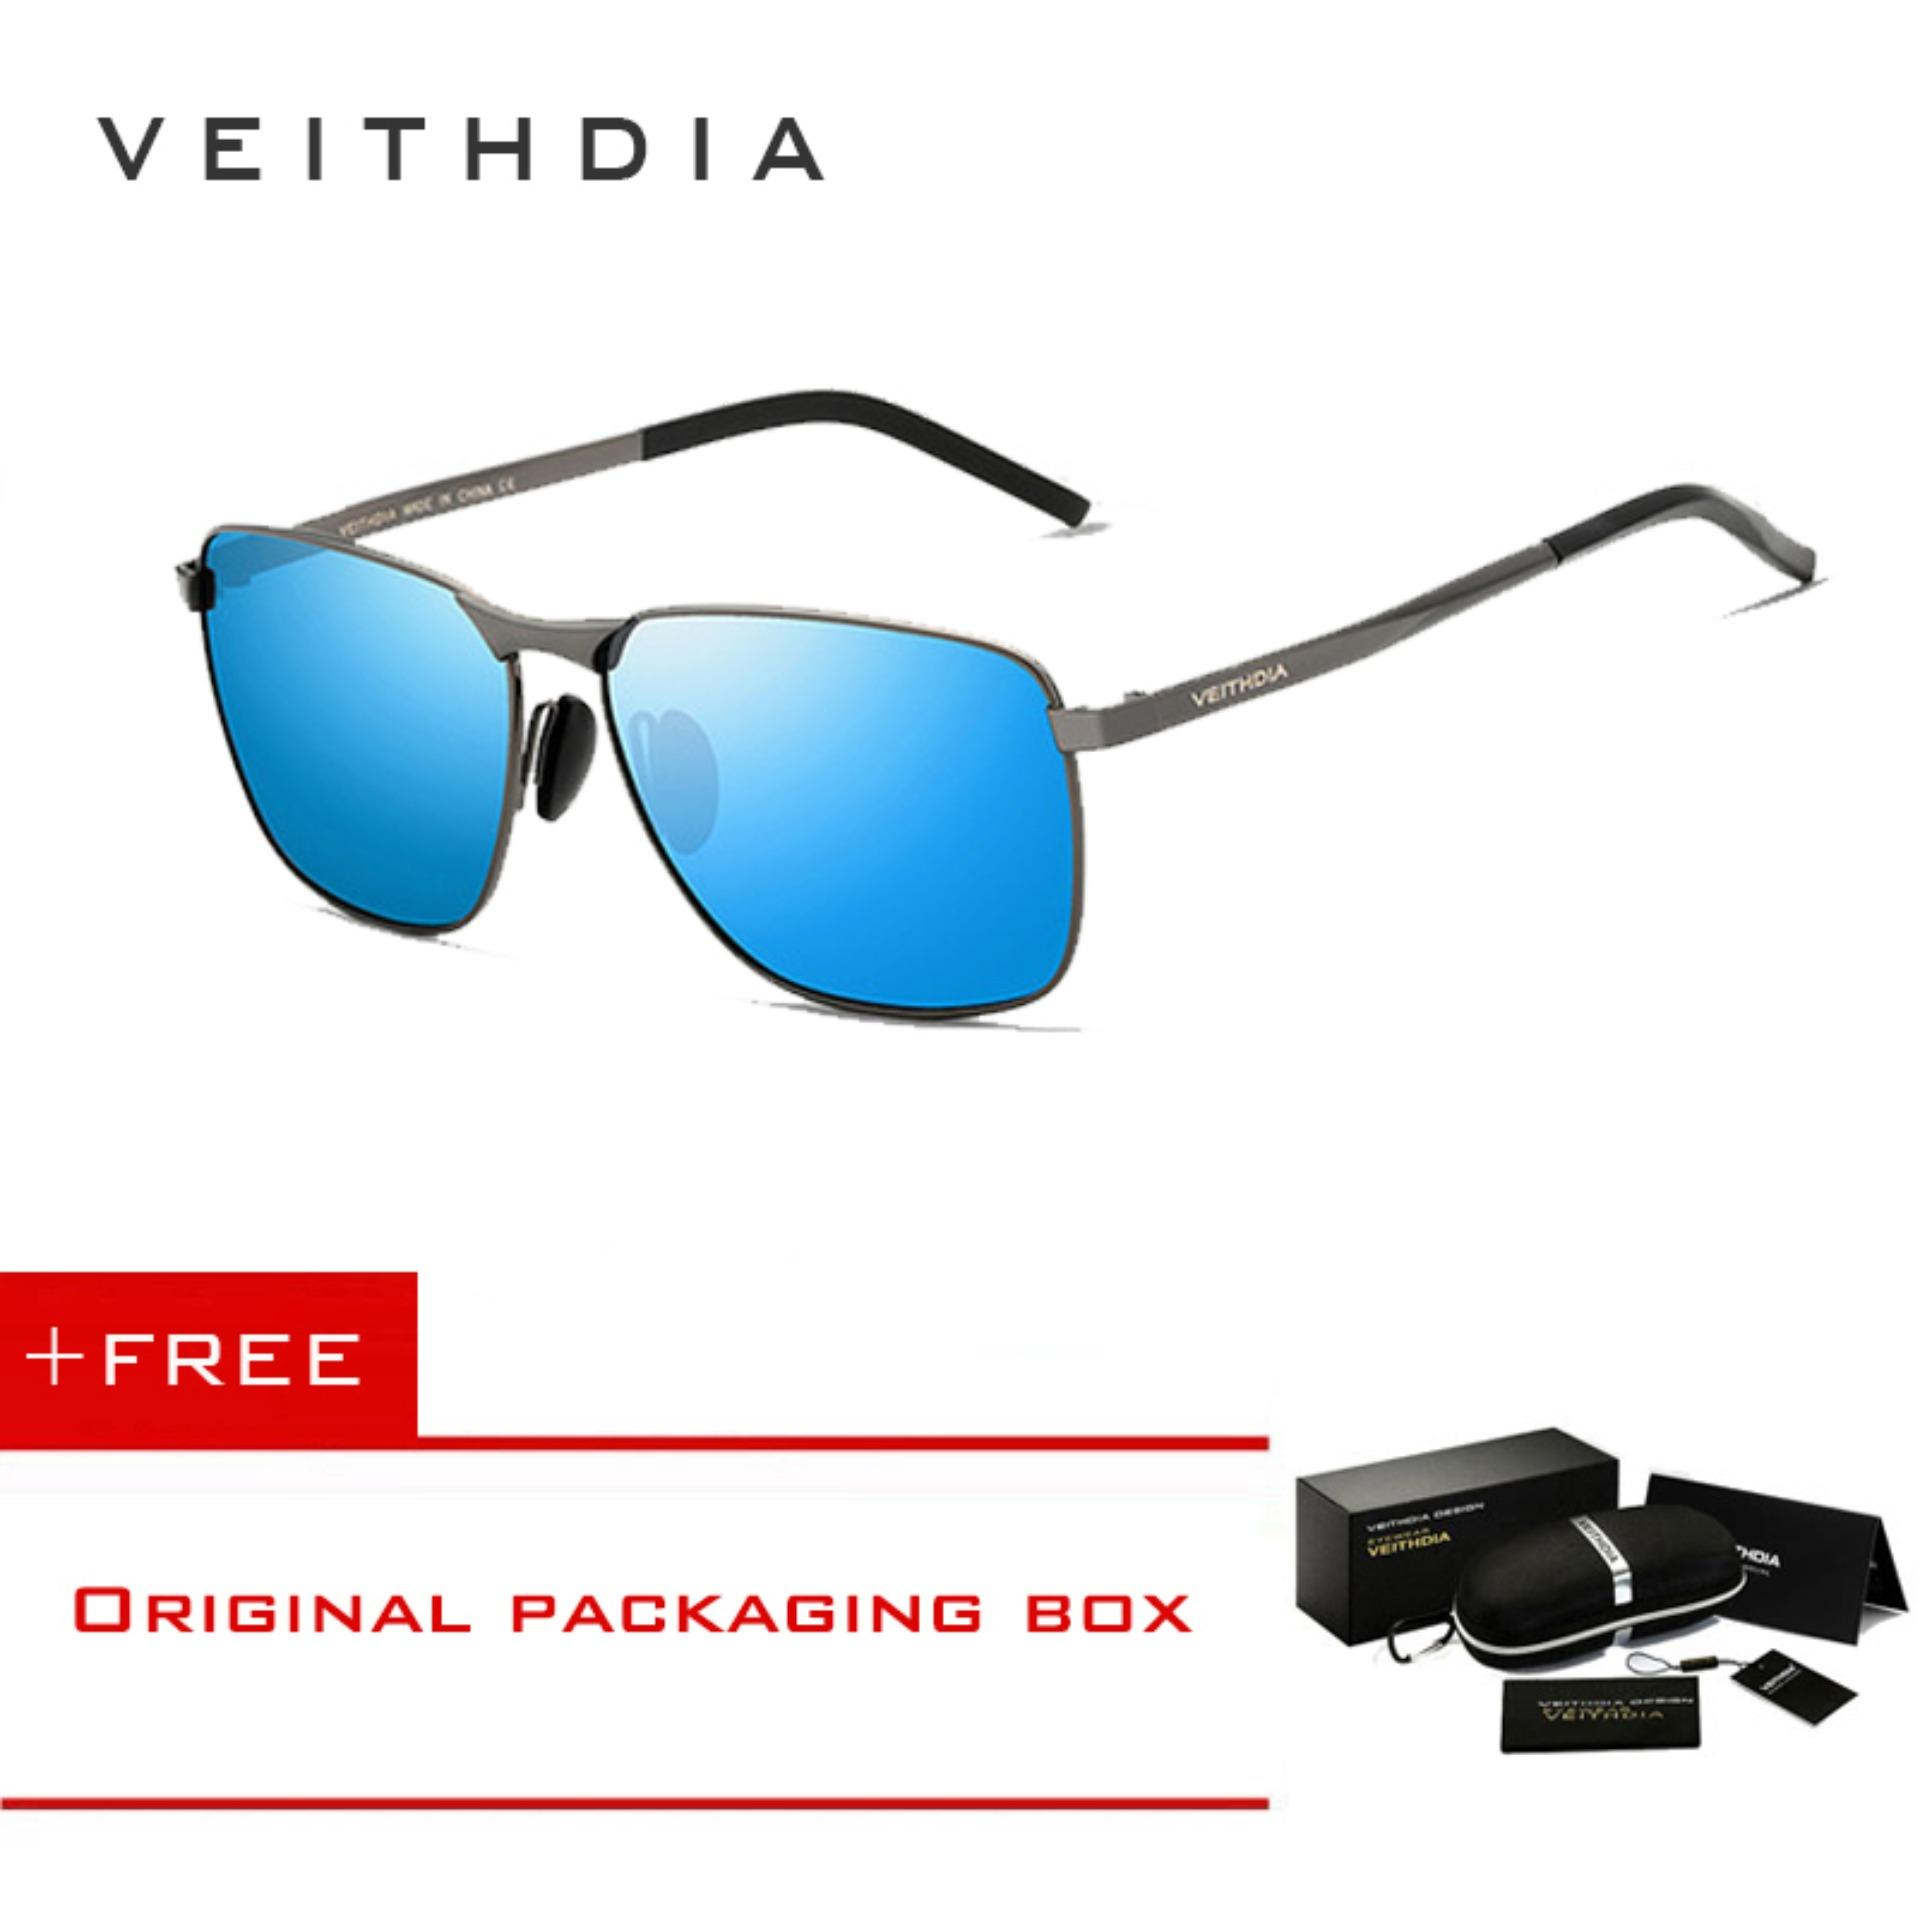 VEITHDIA Kacamata Hitam Sunglasses Pria Termaniskan Polaris Kotak Kacamata 2462